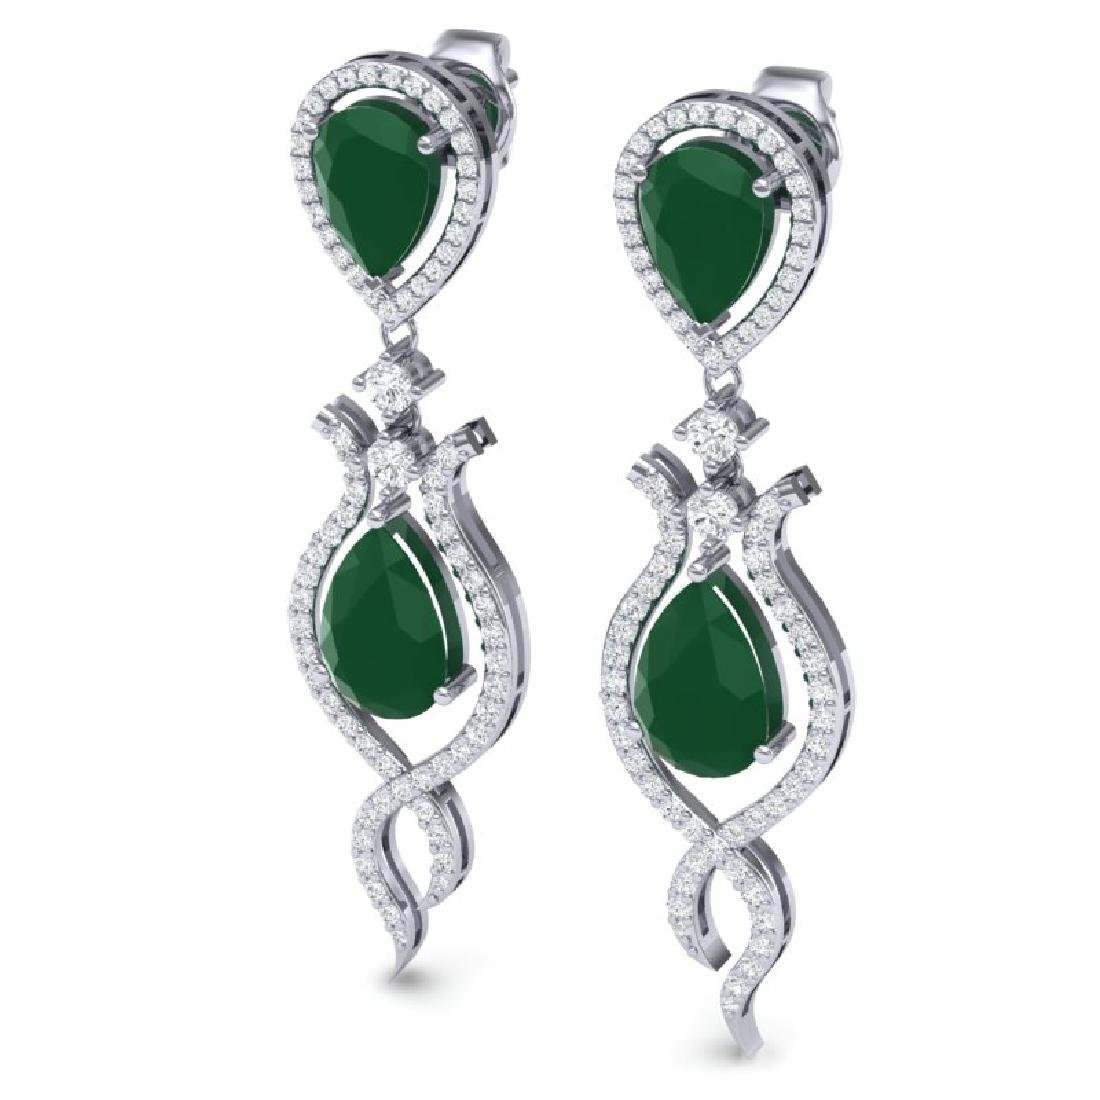 16.57 CTW Royalty Emerald & VS Diamond Earrings 18K - 2